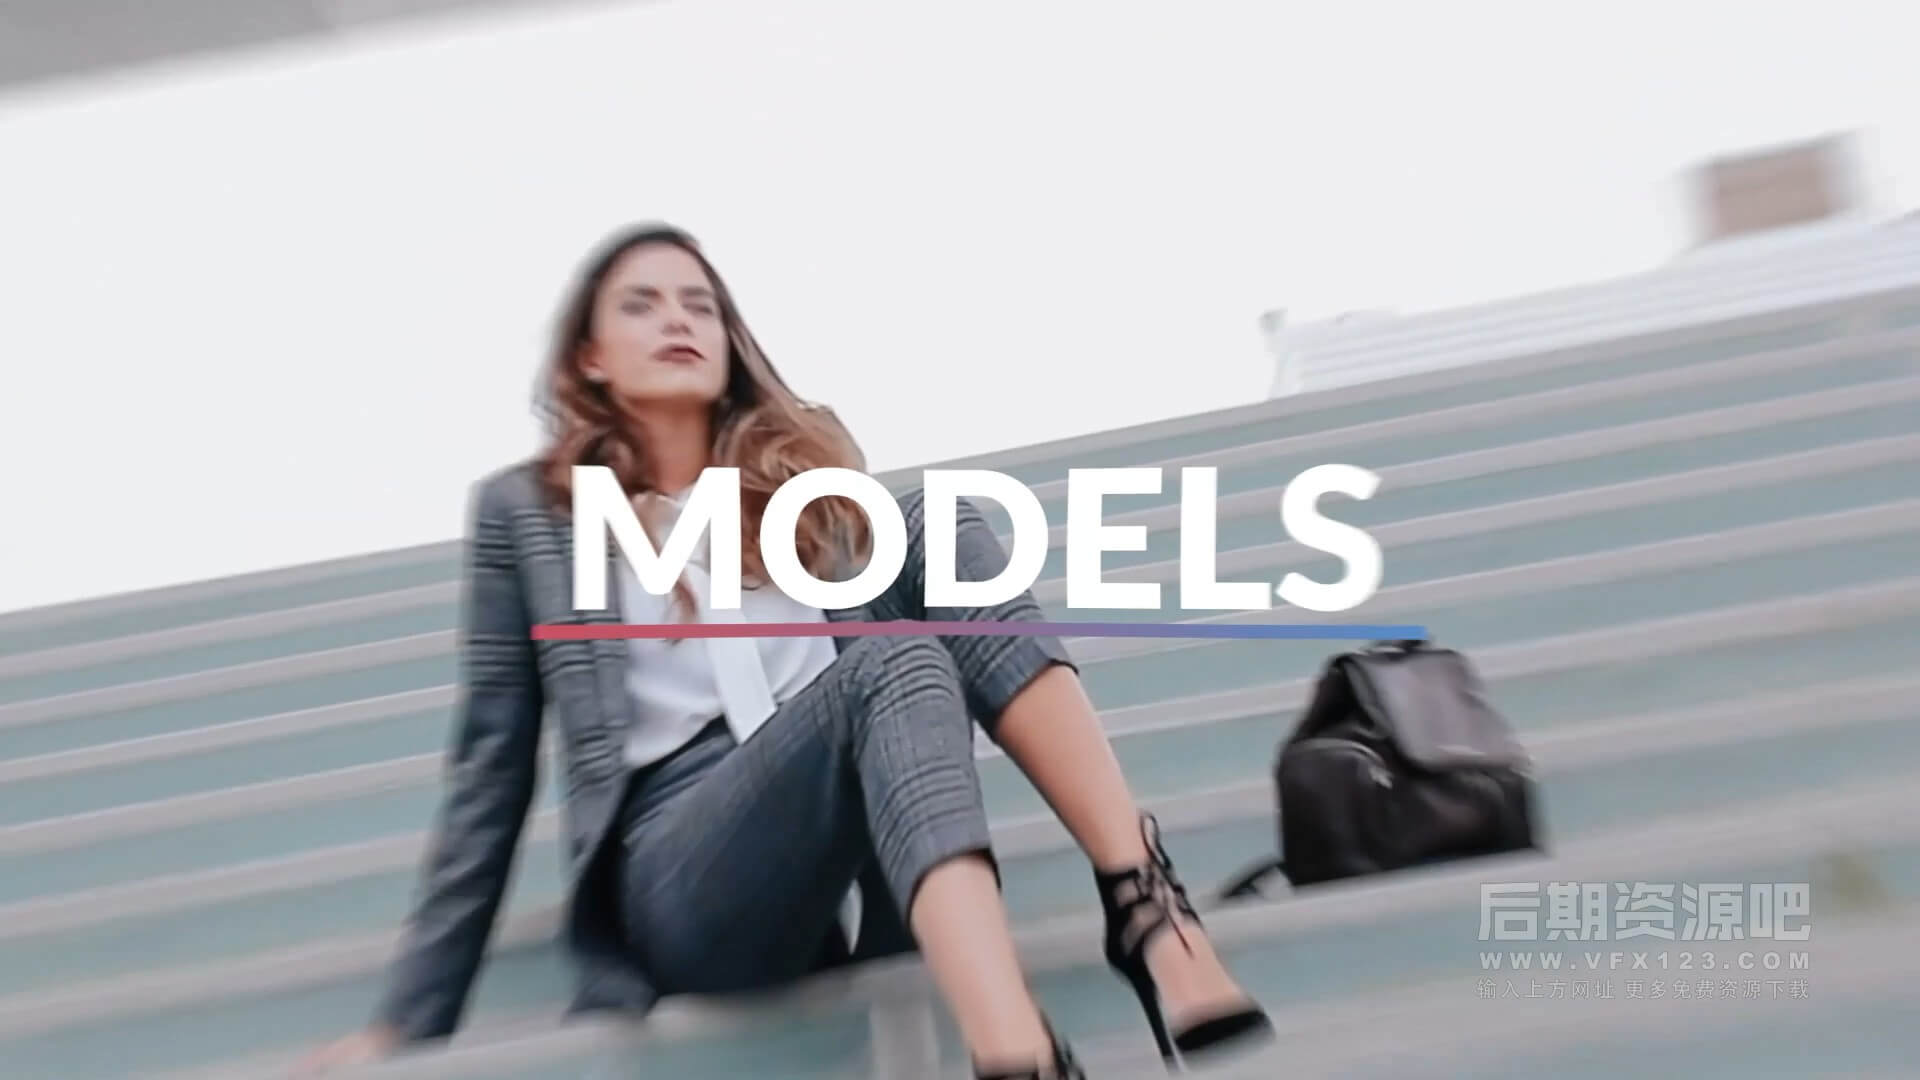 fcpx主题模板 时尚个人写真彰显个性展示片头 My Style Fashion Promo